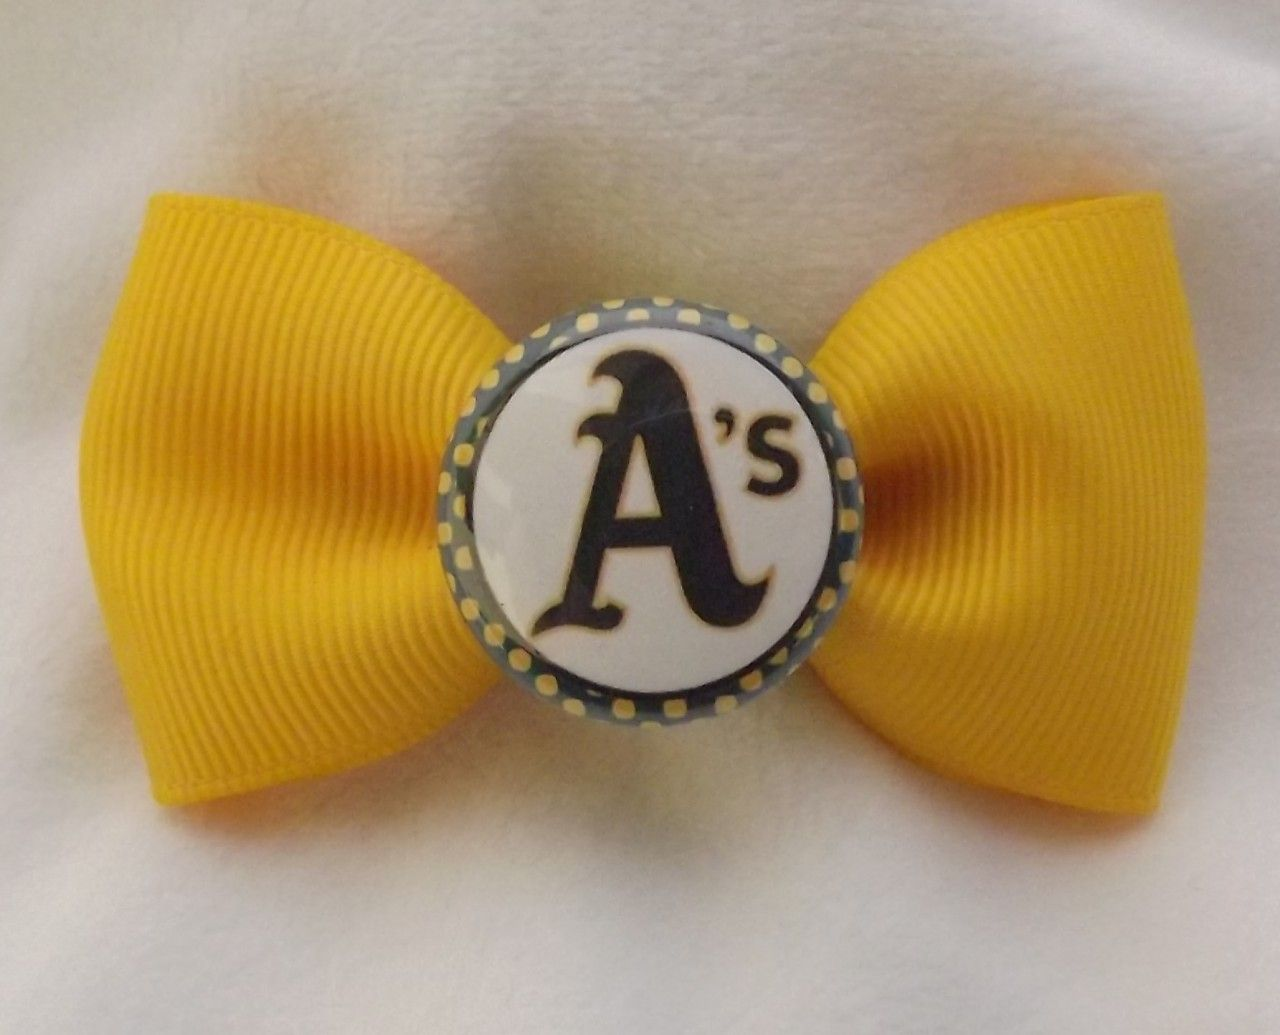 Bug's Bows - Oakland A's Athletics Baseball MLB Hair Bows, $5.00 (http://www.bugsbows.net/oakland-as-athletics-baseball-mlb-hair-bows/)